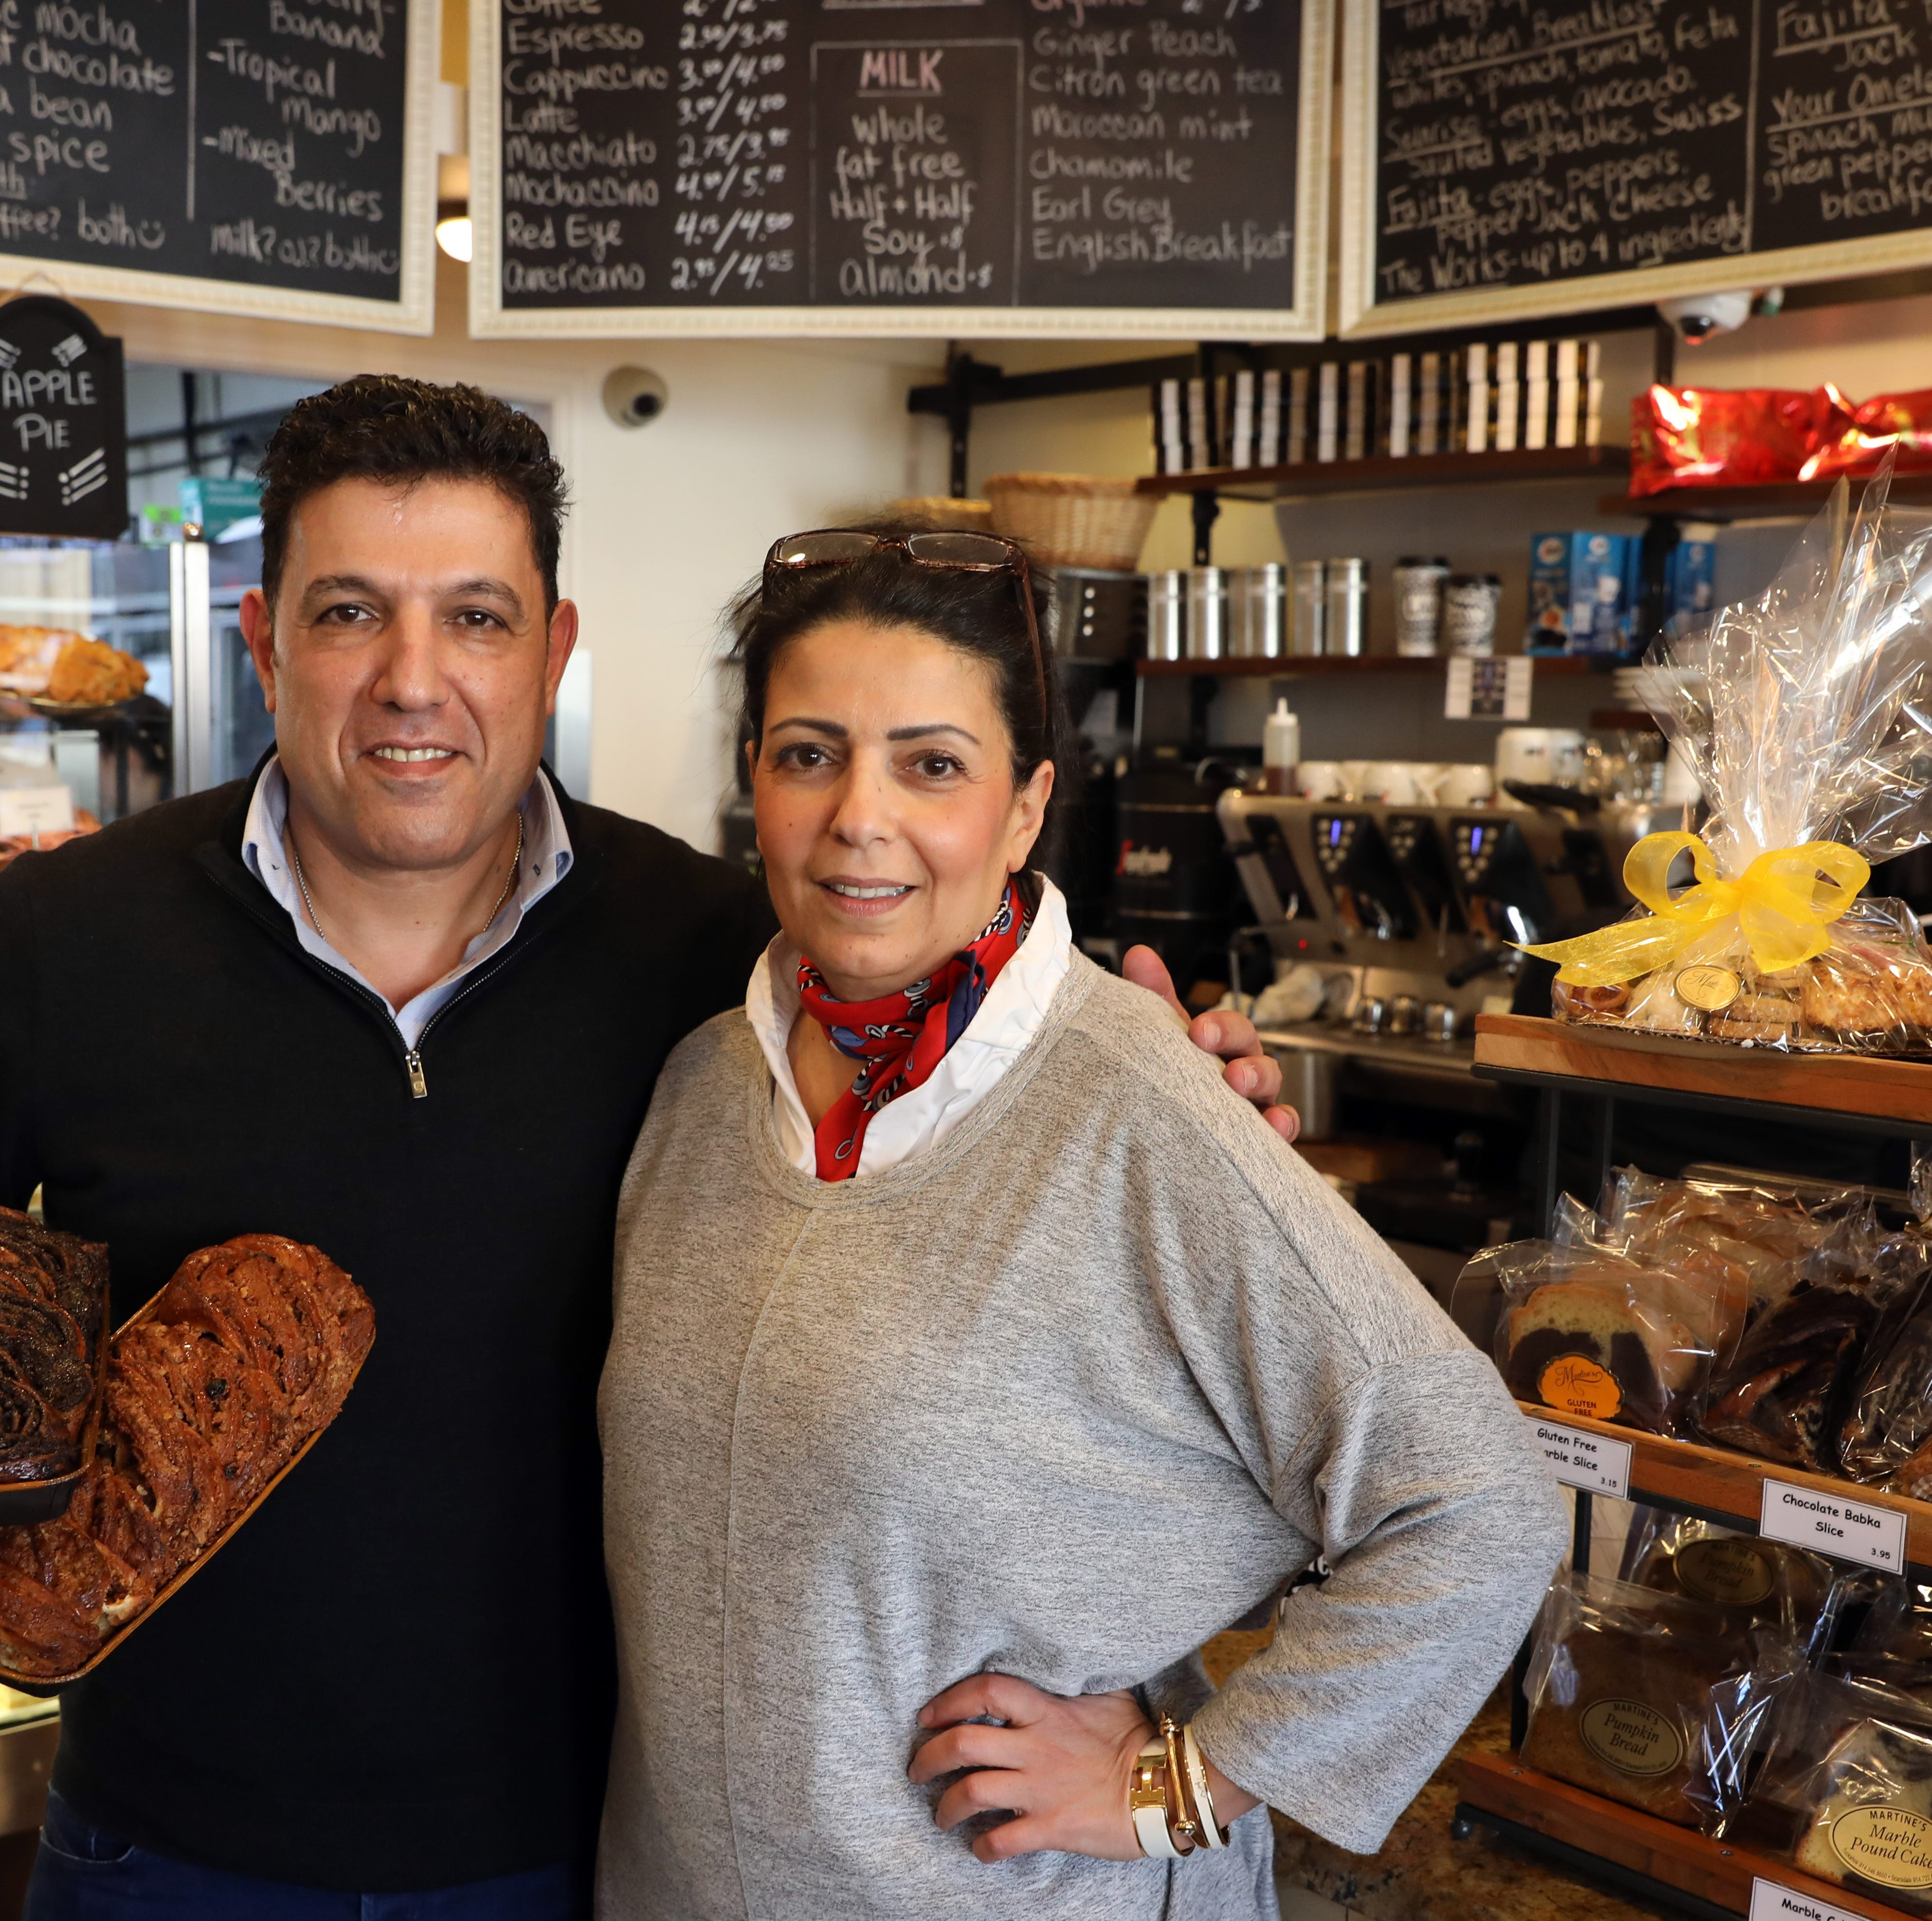 Westchester bakery celebrates 10 years of 'sweet' success